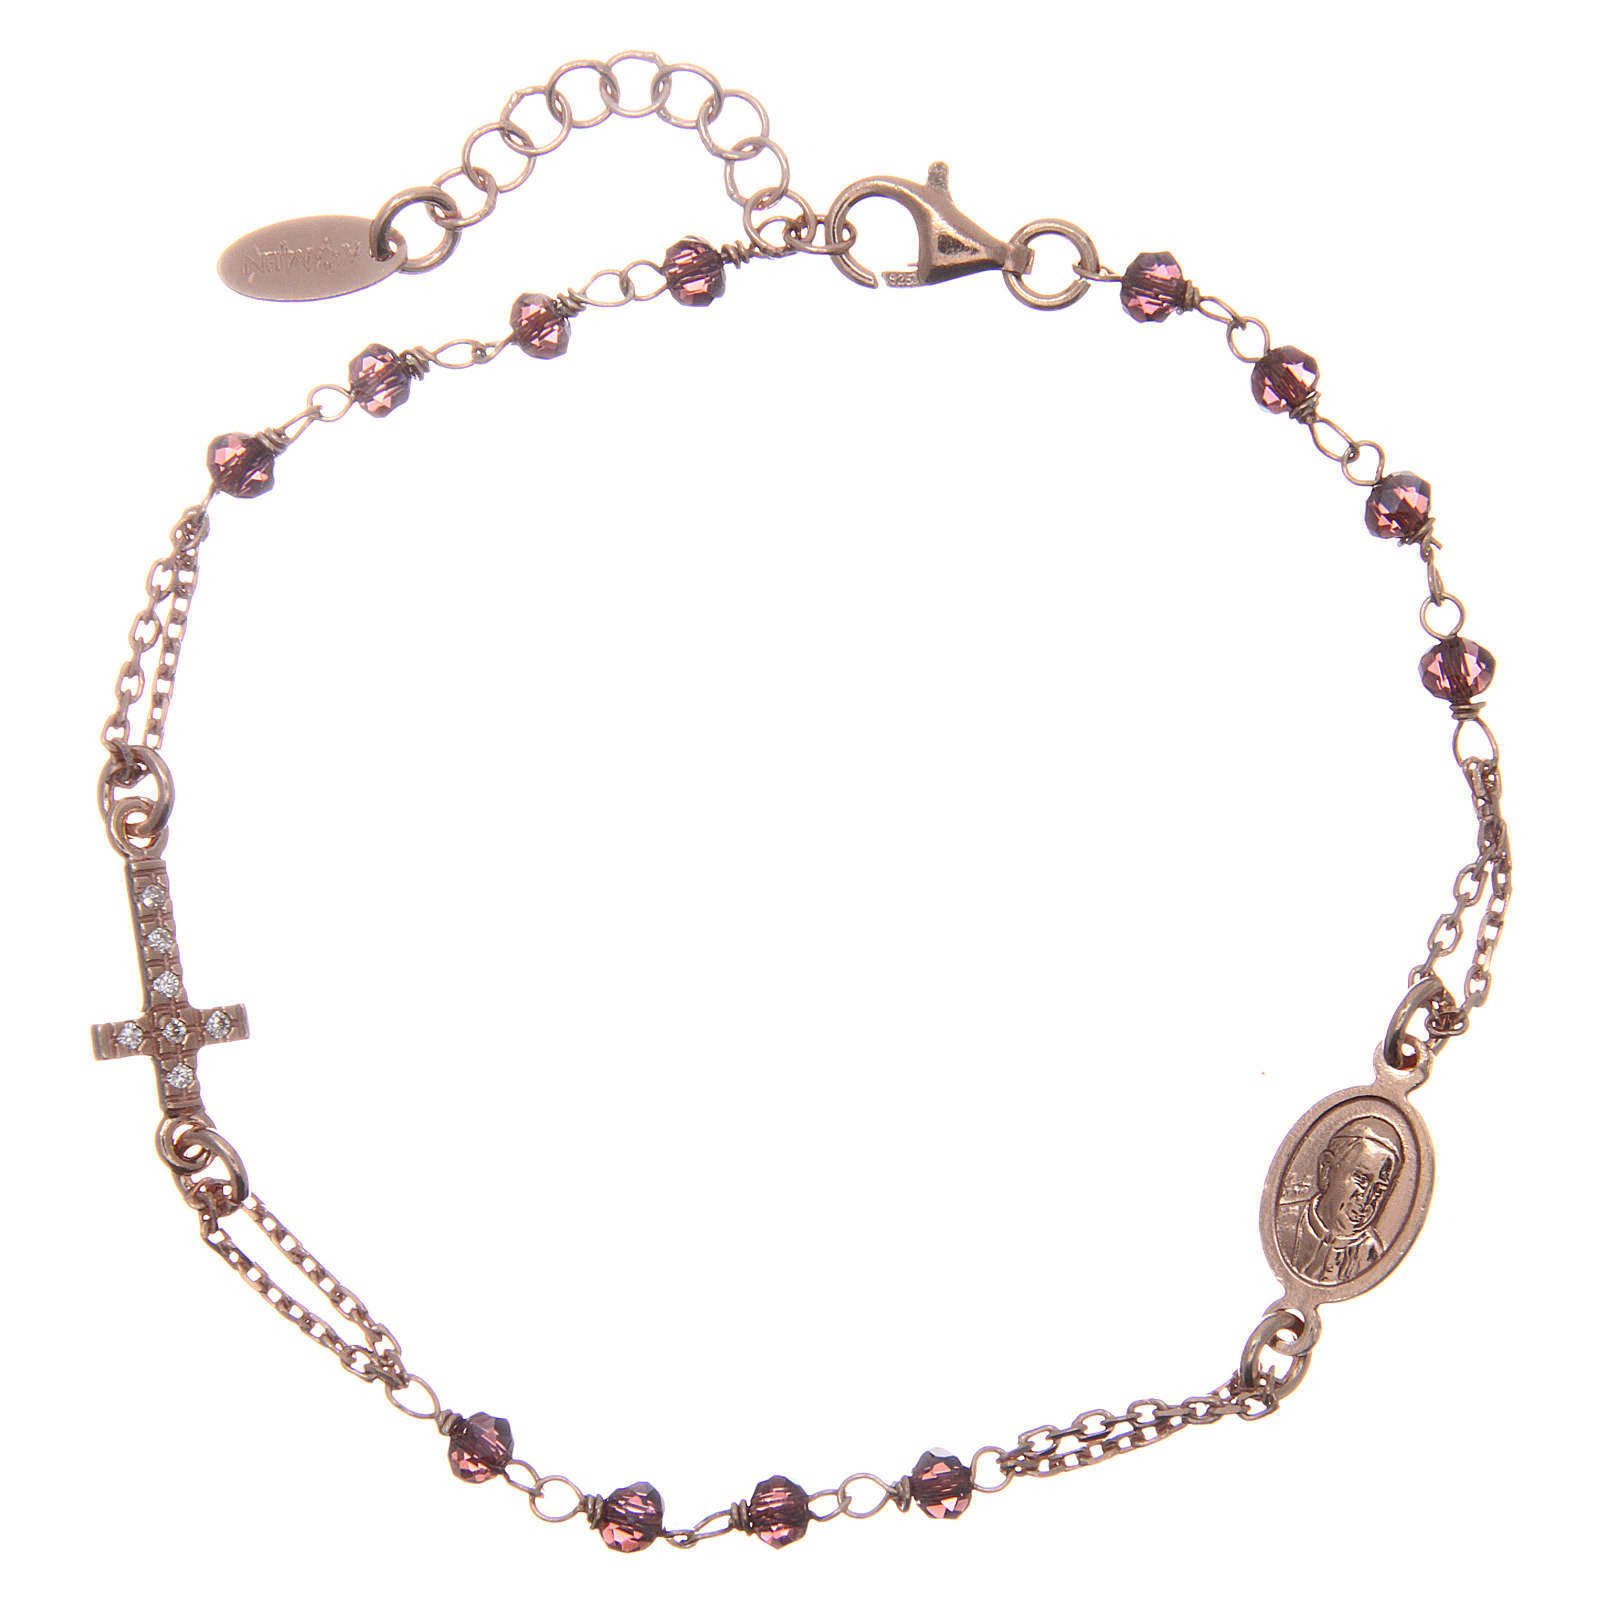 Bracciale AMEN argento 925 rosé cristalli viola zirconi bianchi 4